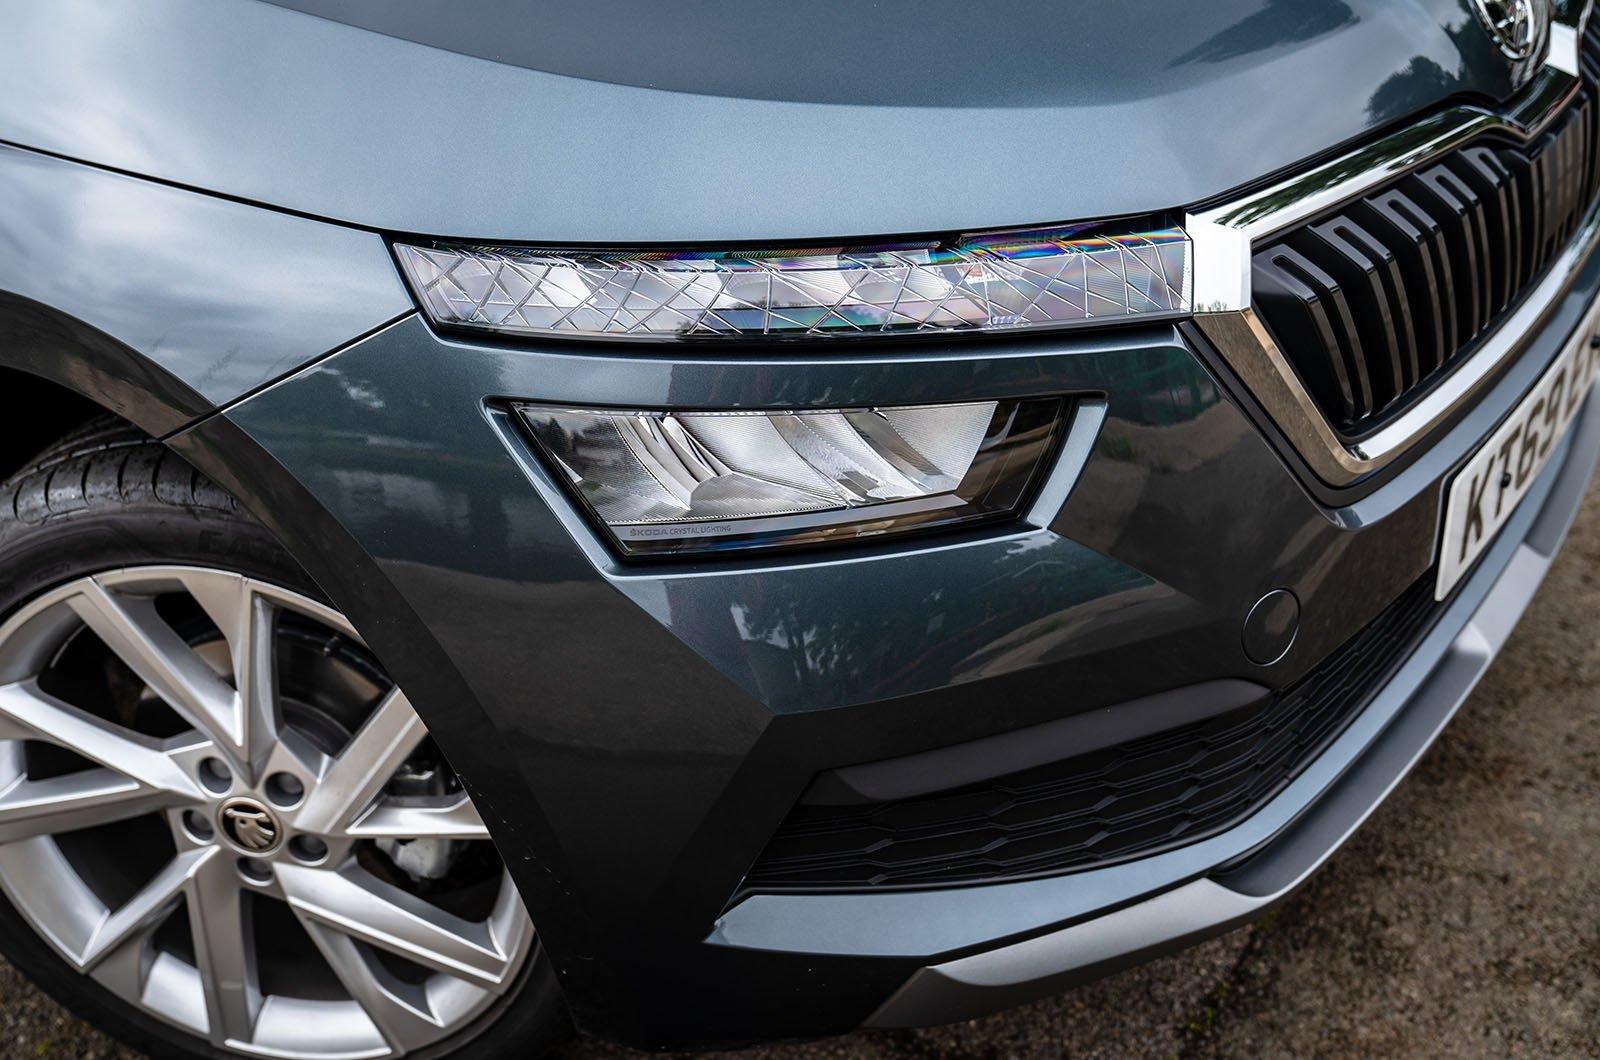 Skoda Kamiq front headlight detail